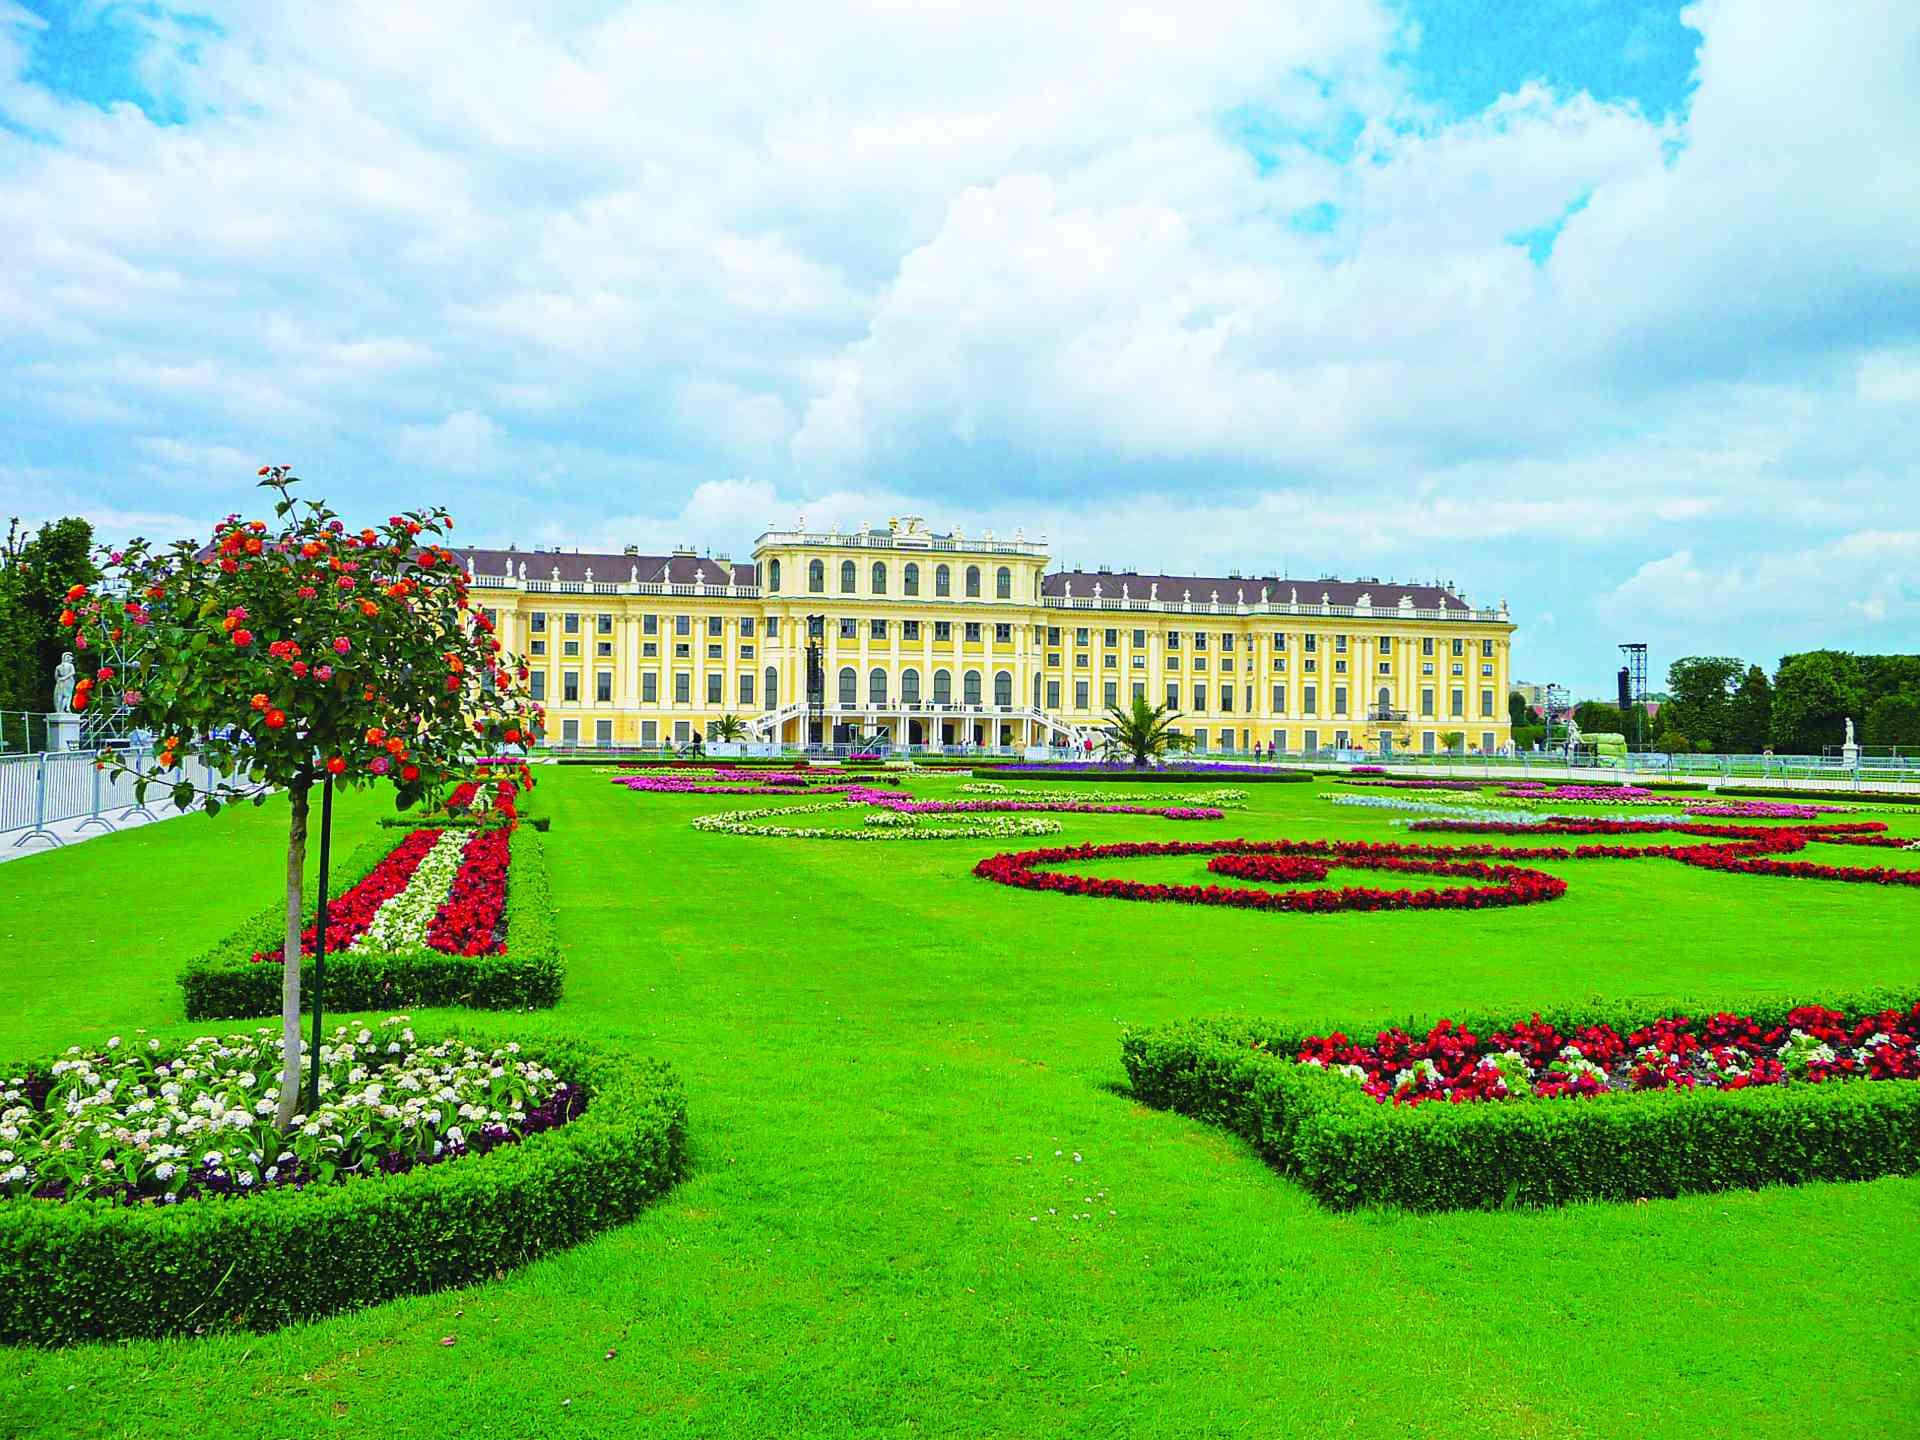 Schonbrunn Palace, Vienna, Austria by Dennis Bunnik